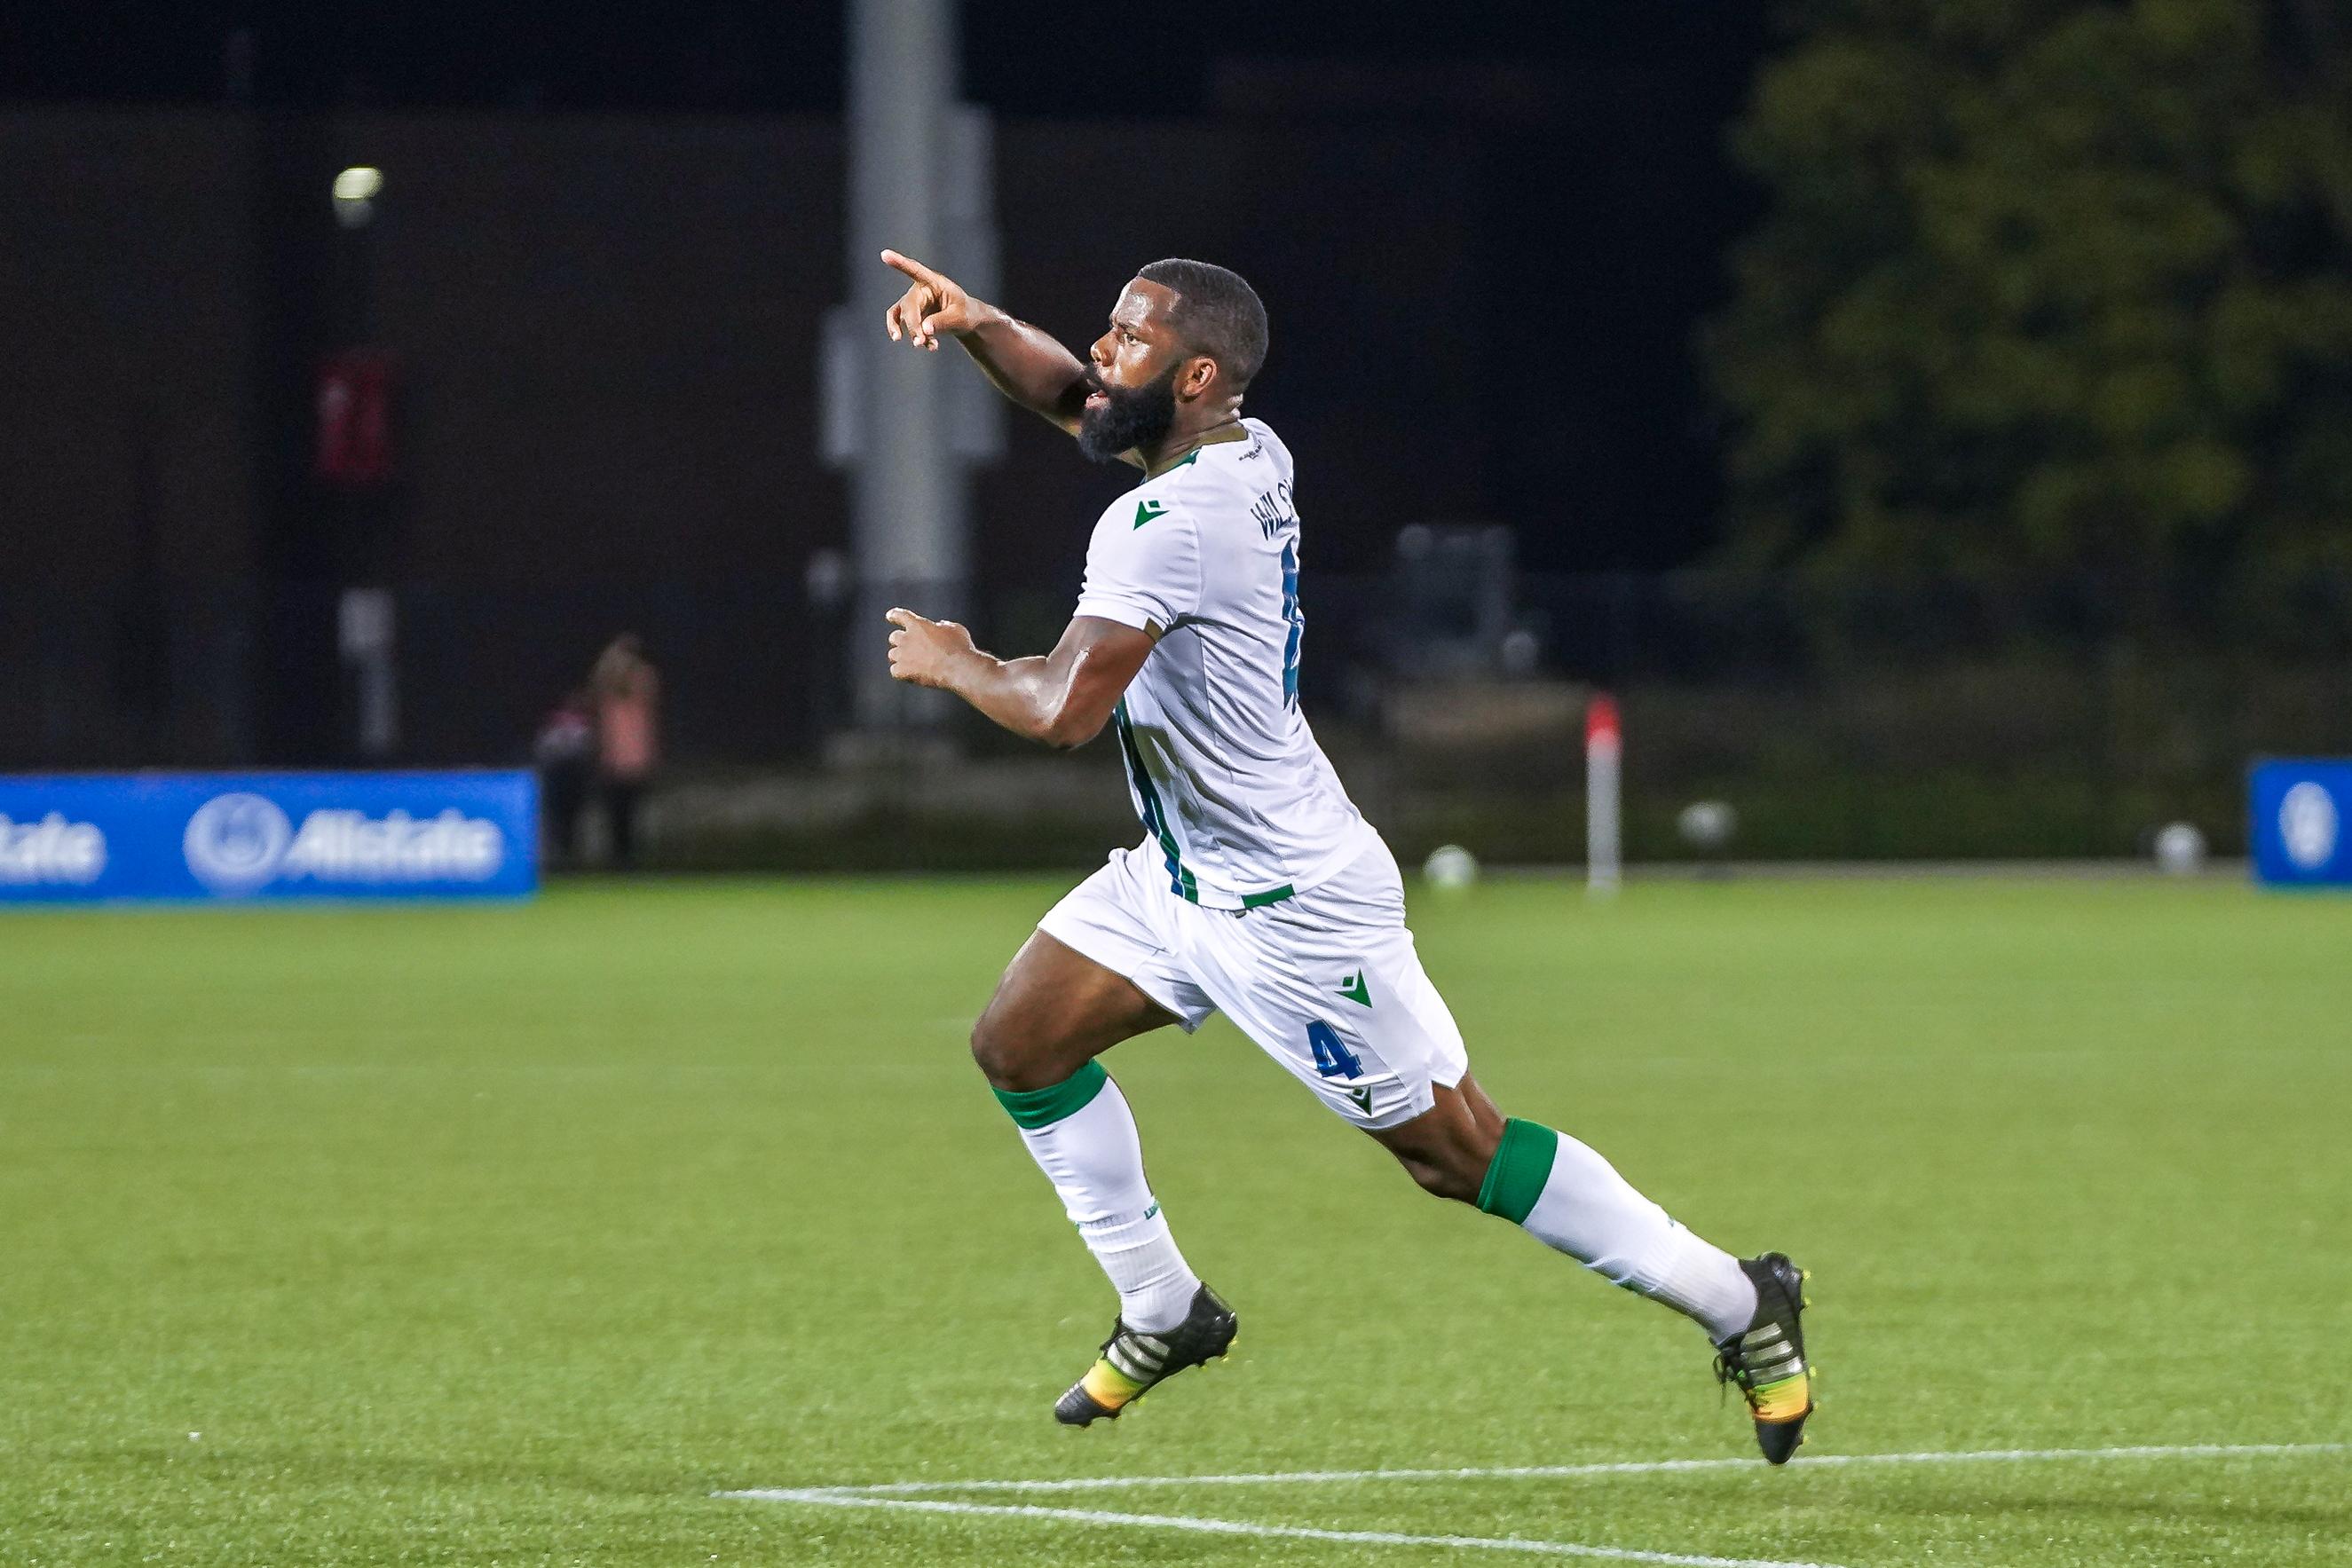 Jordan Wilson celebrates scoring the late equalizer. (York United/CPL)